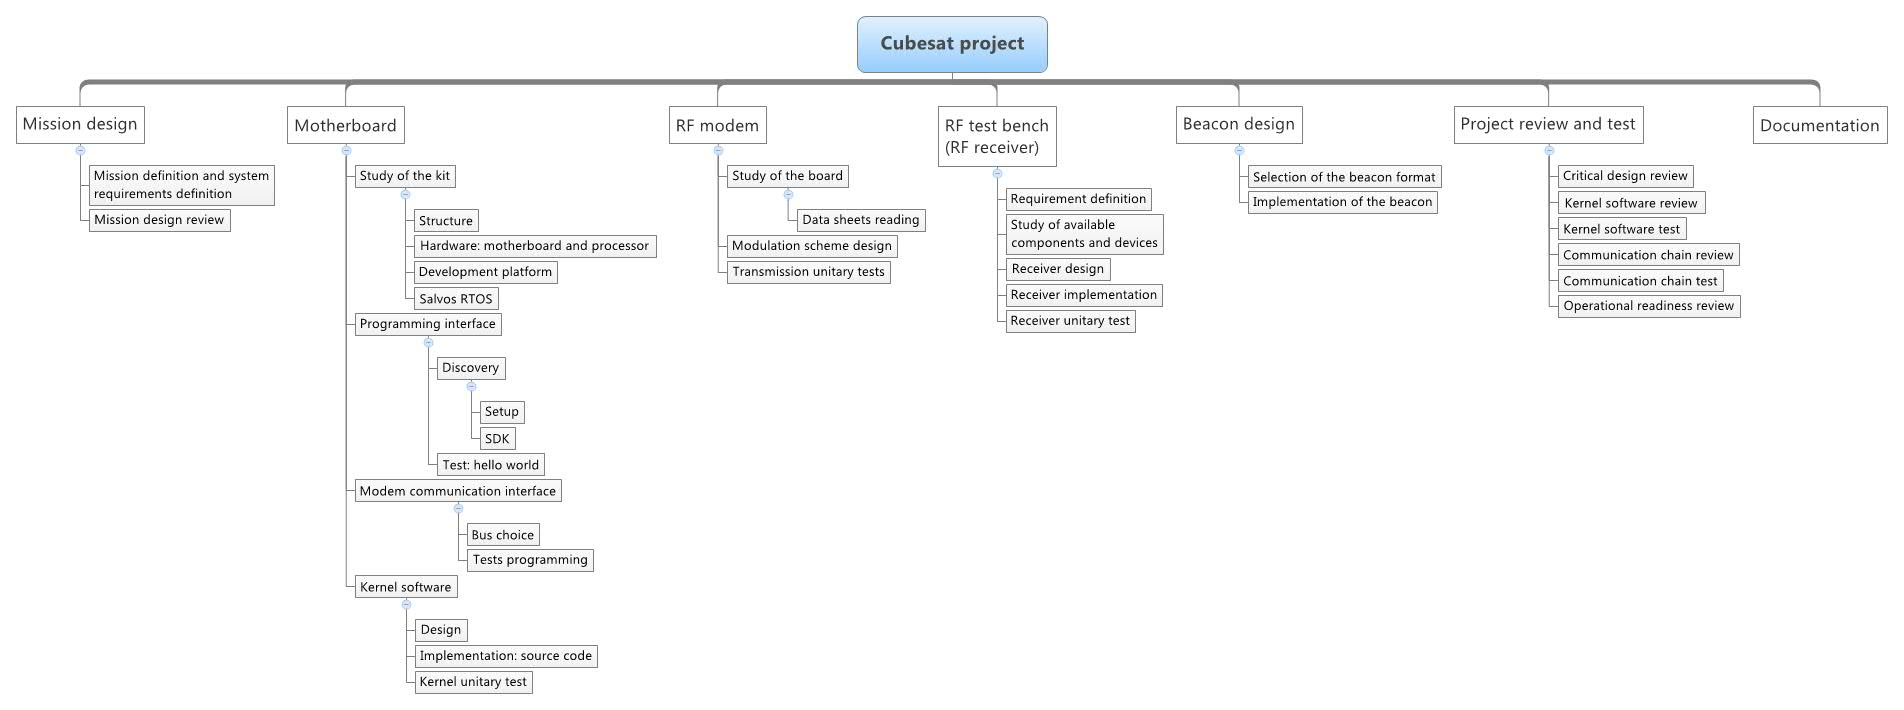 Objectives and project planning - 2014 Sputnik strikes back